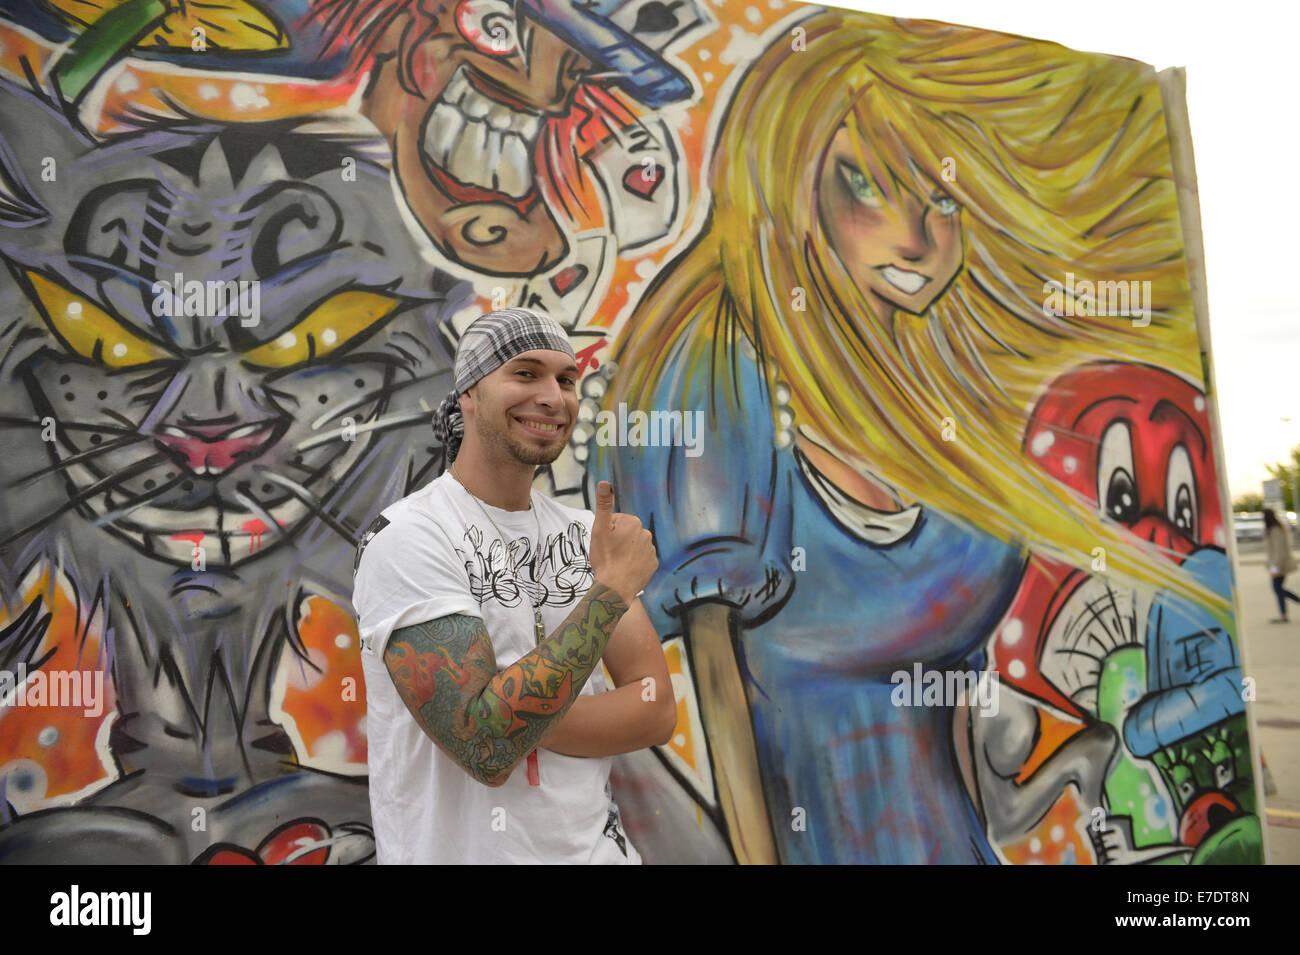 Garden City, New York, USA. 14th Sep, 2014. JEAN PAUL SALIBA, aka Draft, of Farmingdale, is a graffiti artist creating - Stock Image